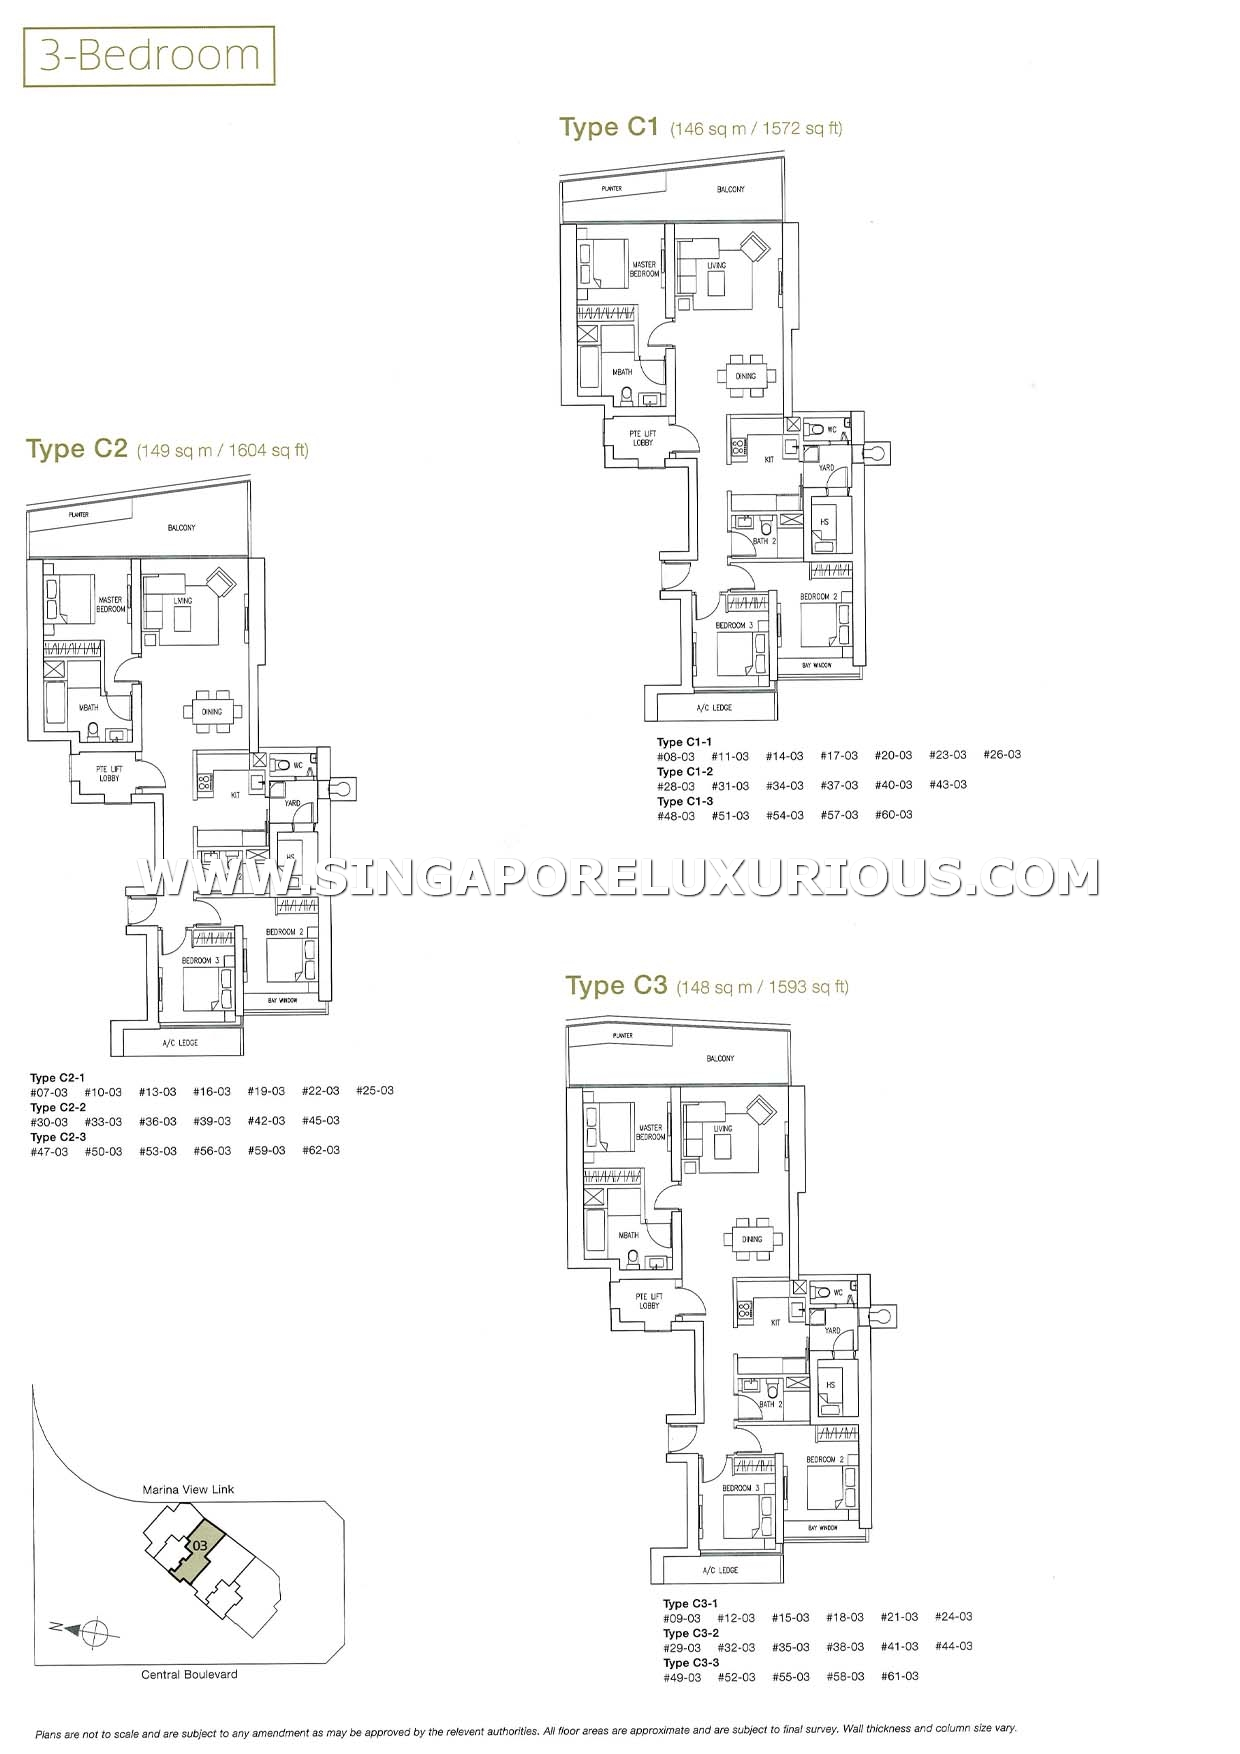 Marina Bay Suites Site Amp Floor Plan Singapore Luxurious